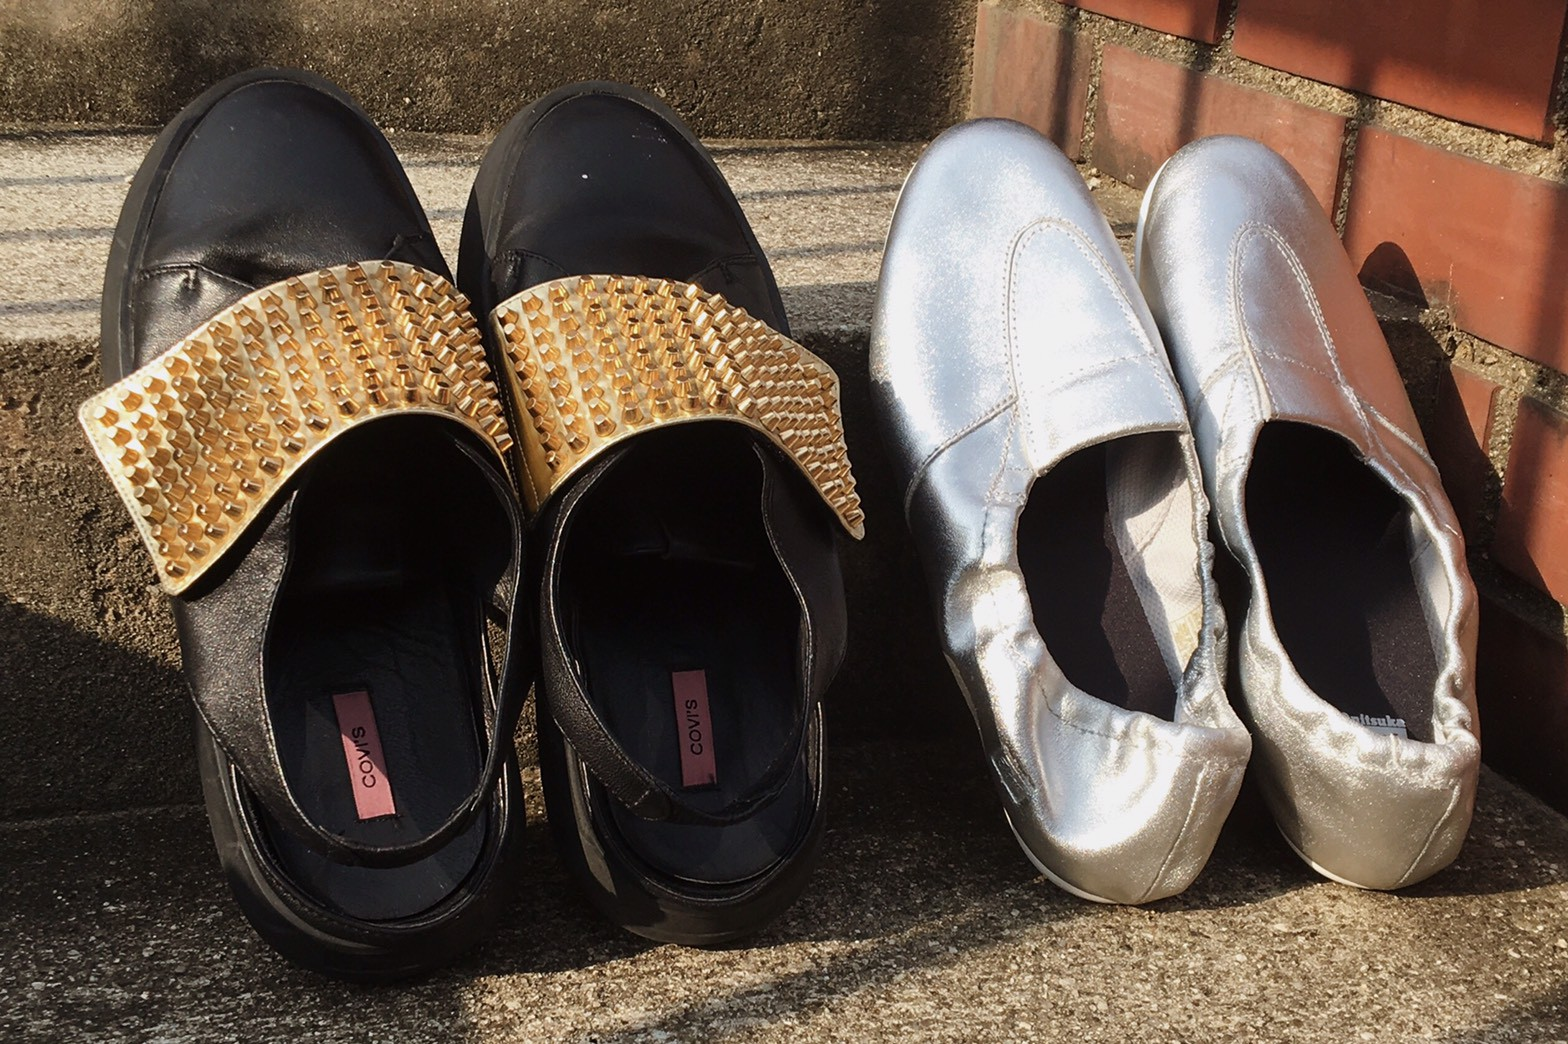 【USED】ゴールド派?シルバー派?今すぐほしい靴はどっち